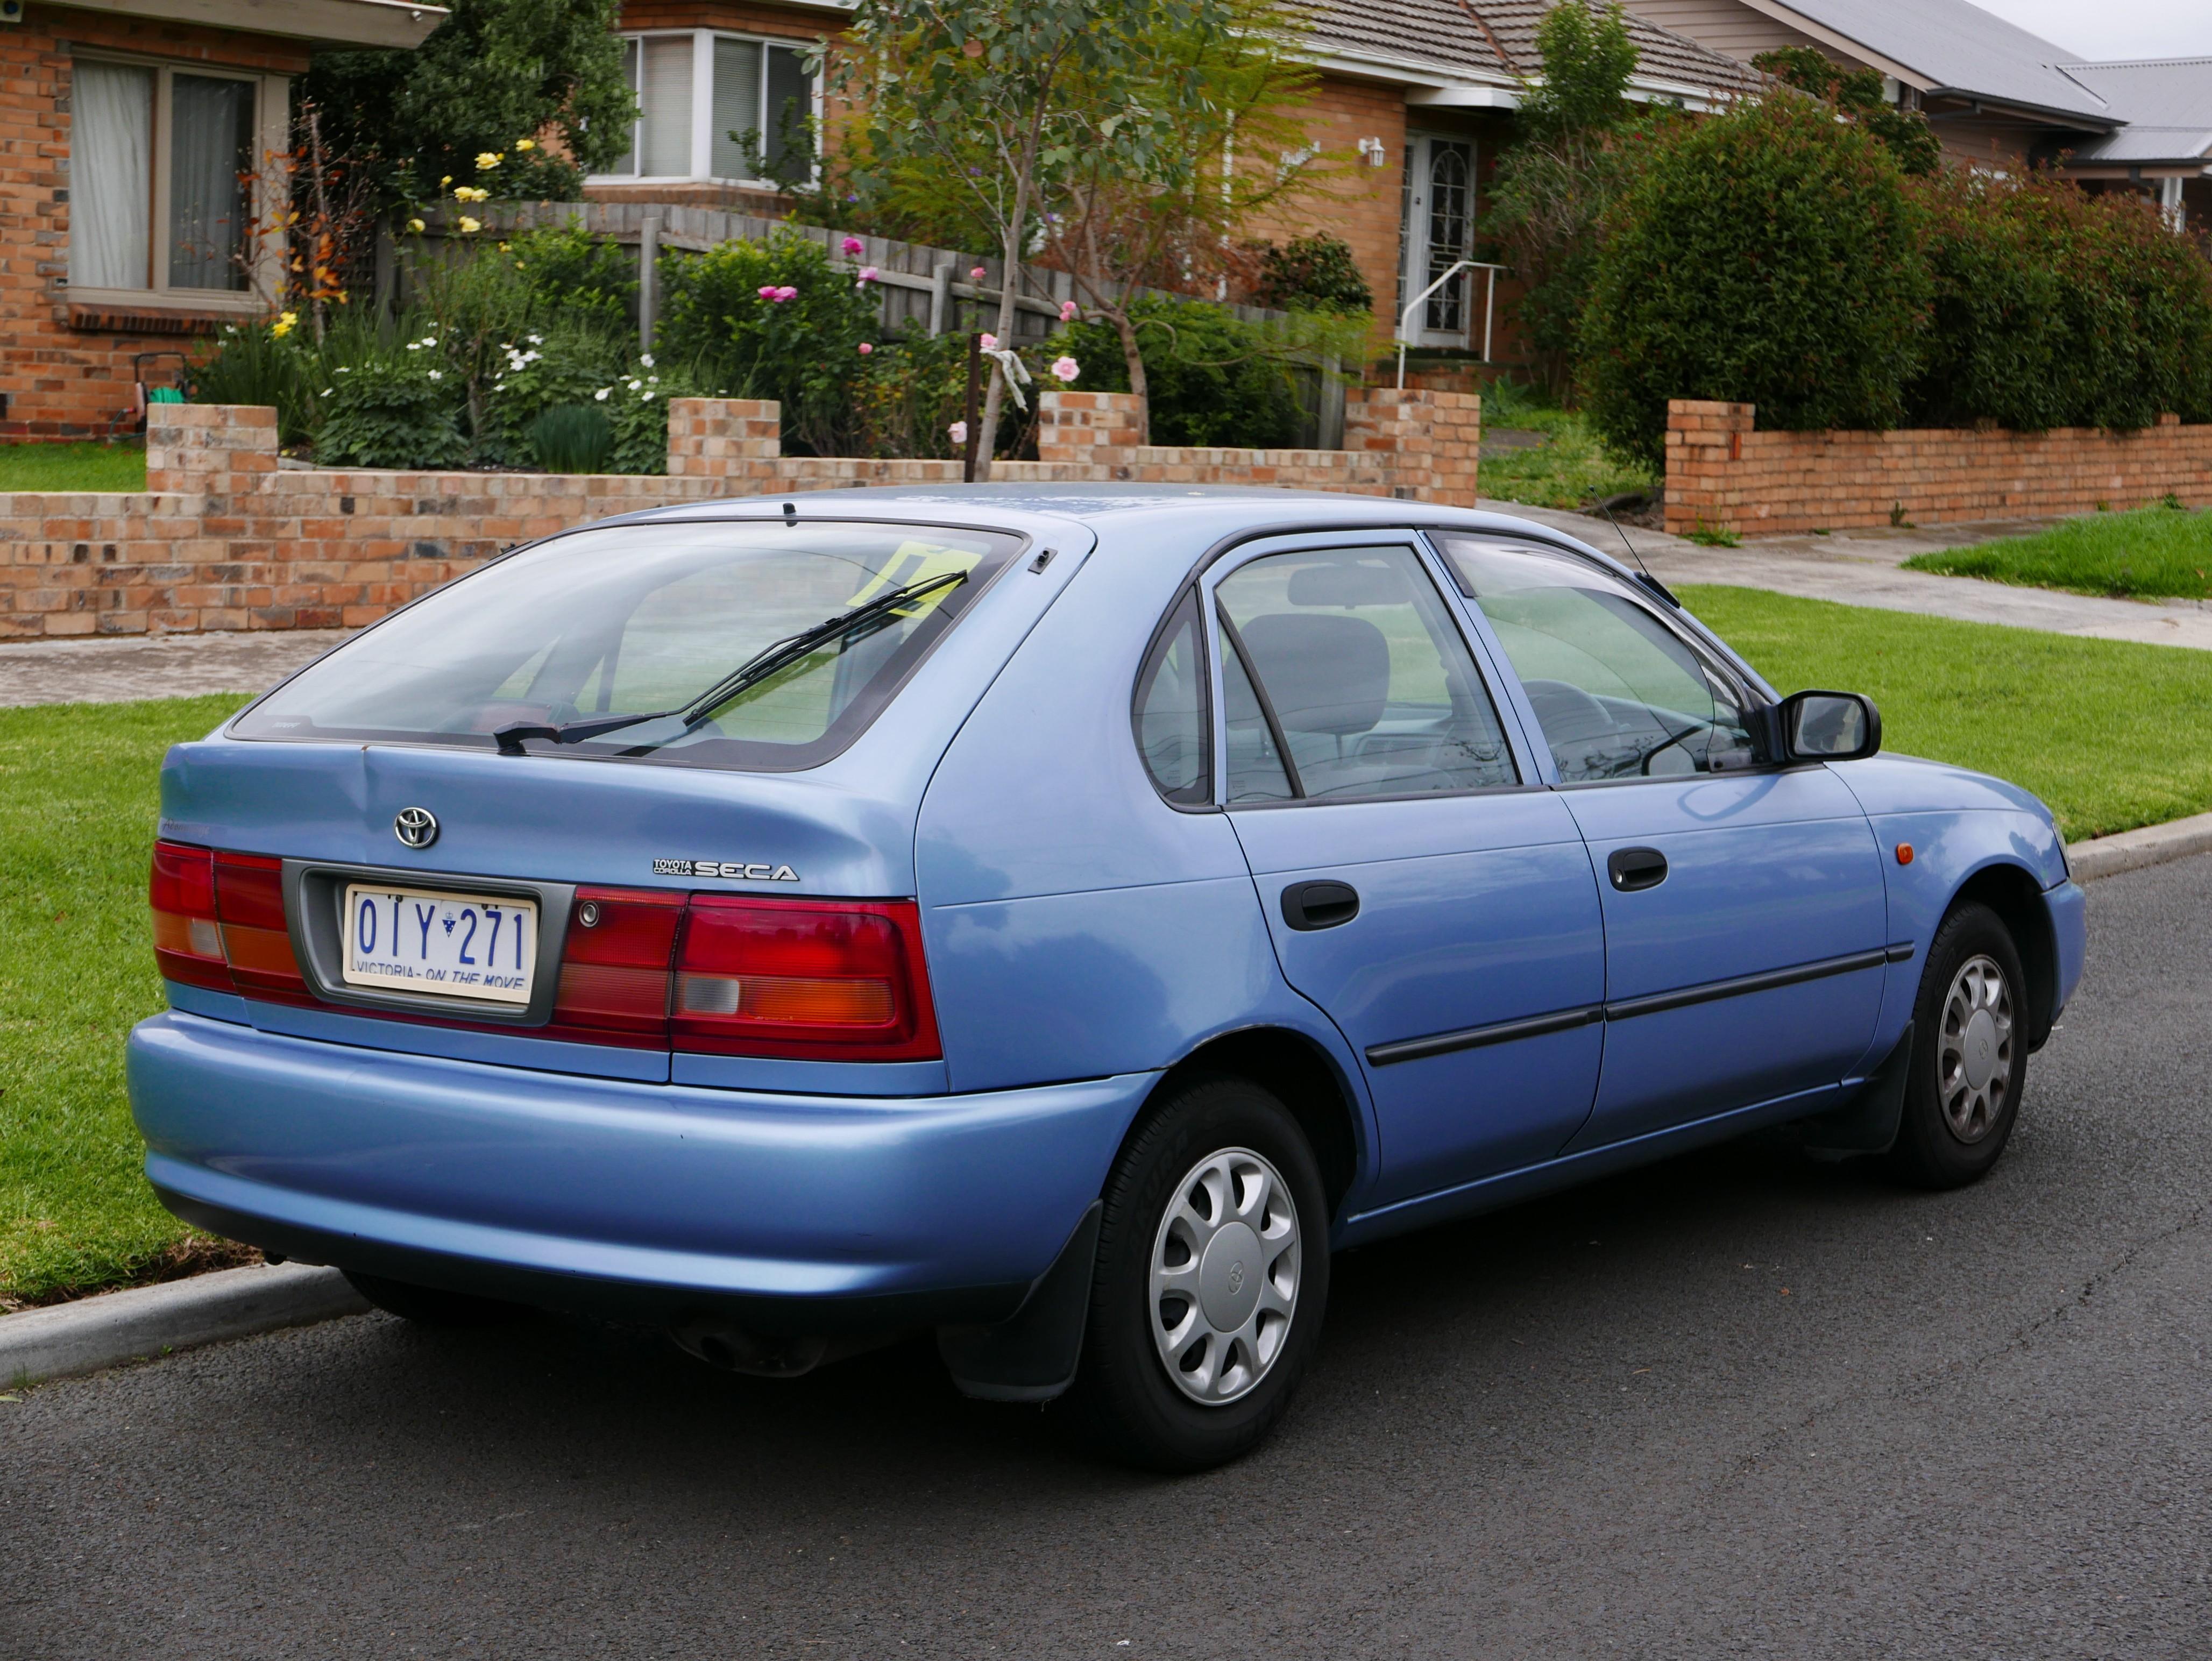 1997 toyota Corolla Engine Diagram File 1997 toyota Corolla Ae101r Advantage Seca 5 Door Hatchback Of 1997 toyota Corolla Engine Diagram